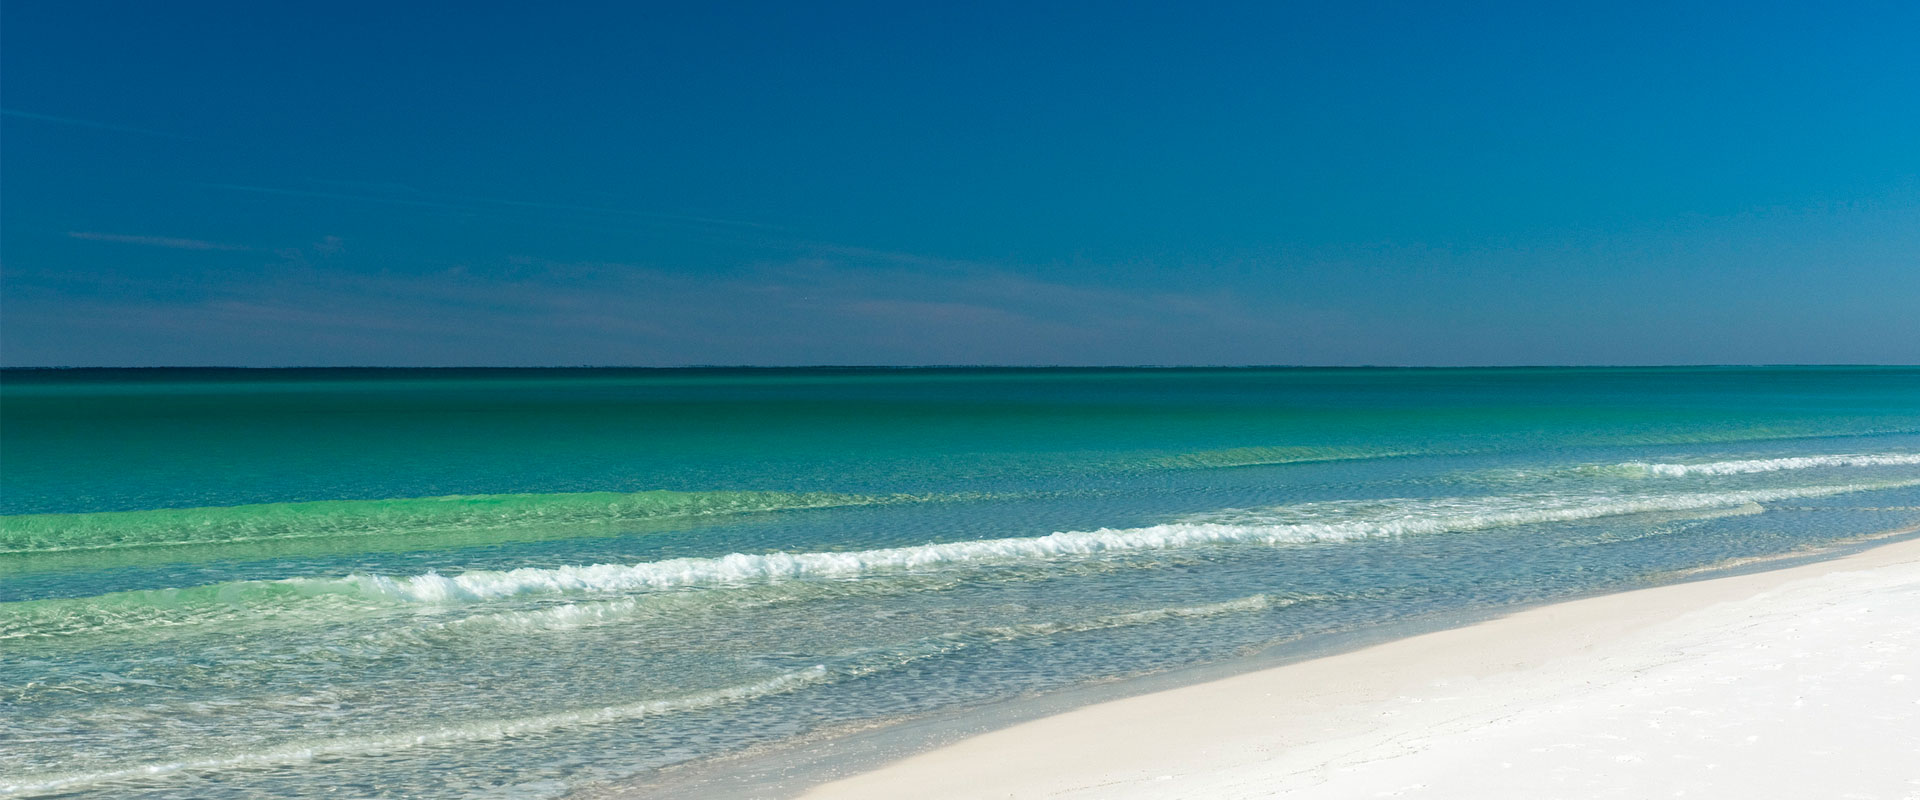 Beach Image #4